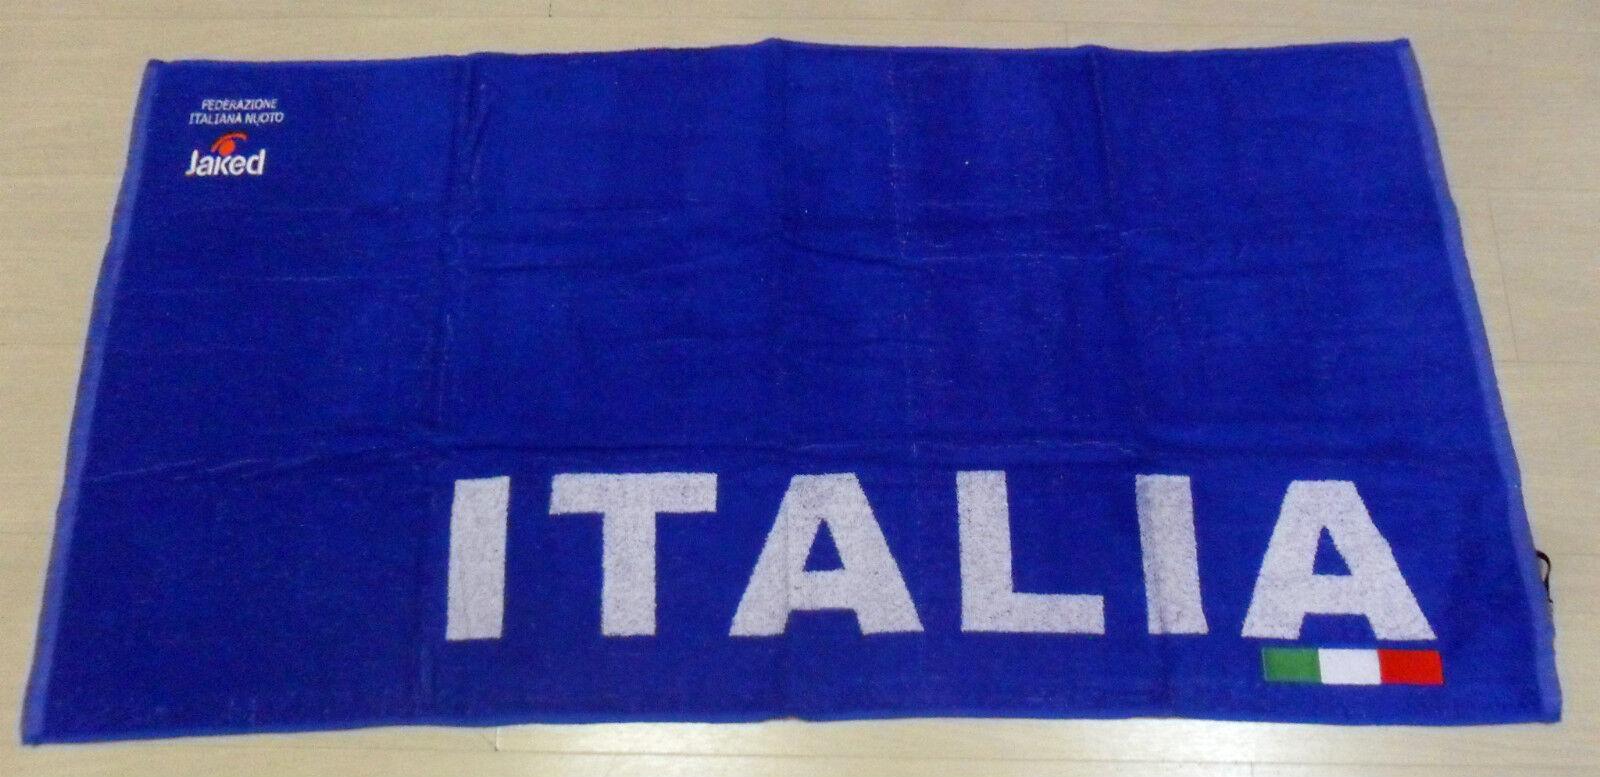 10066 JAKED FROM FÉDÉRATION ITALIAN SWIMMING TOWEL TOWEL ITALY 2013 TOWEL